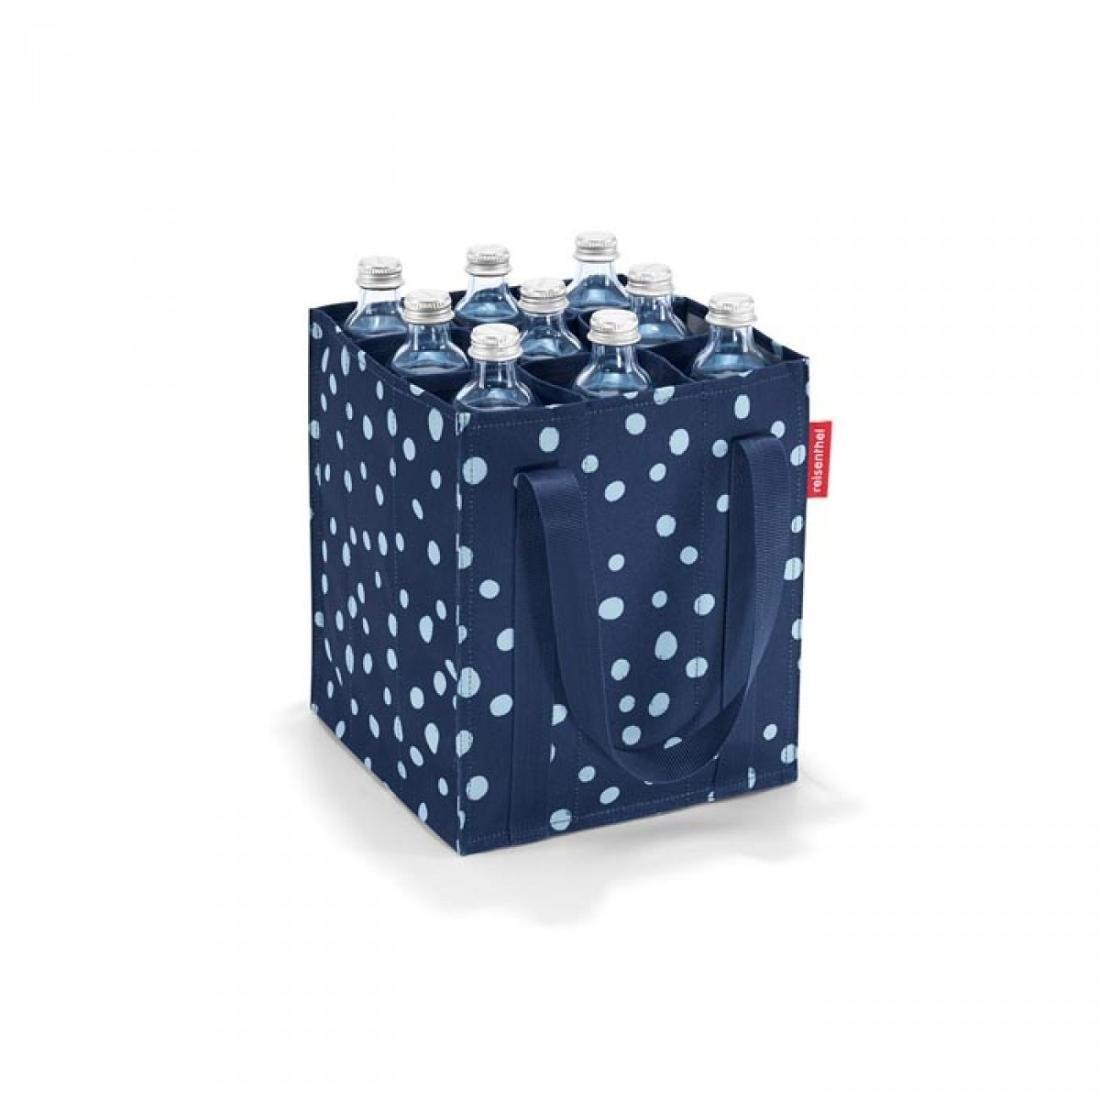 Reisenthel Torba na butelki REISENTHEL Spots, granatowa, 24x28x24 cm